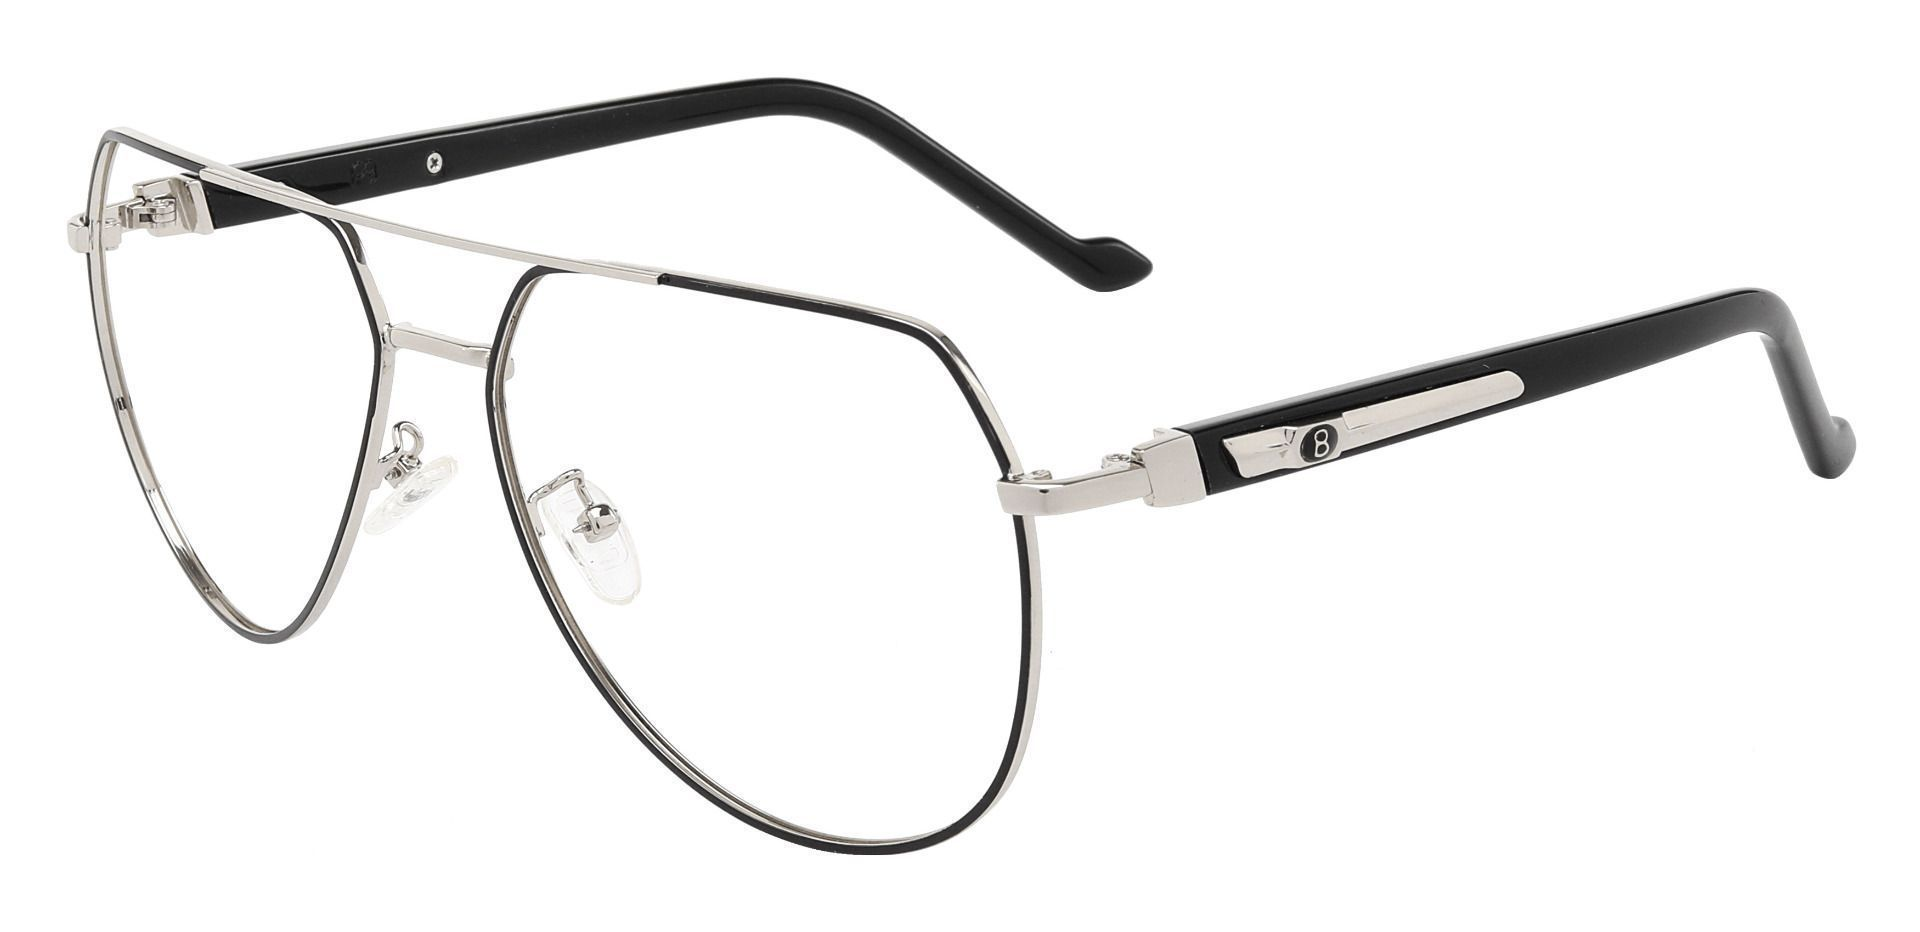 Wright Aviator Single Vision Glasses - Black